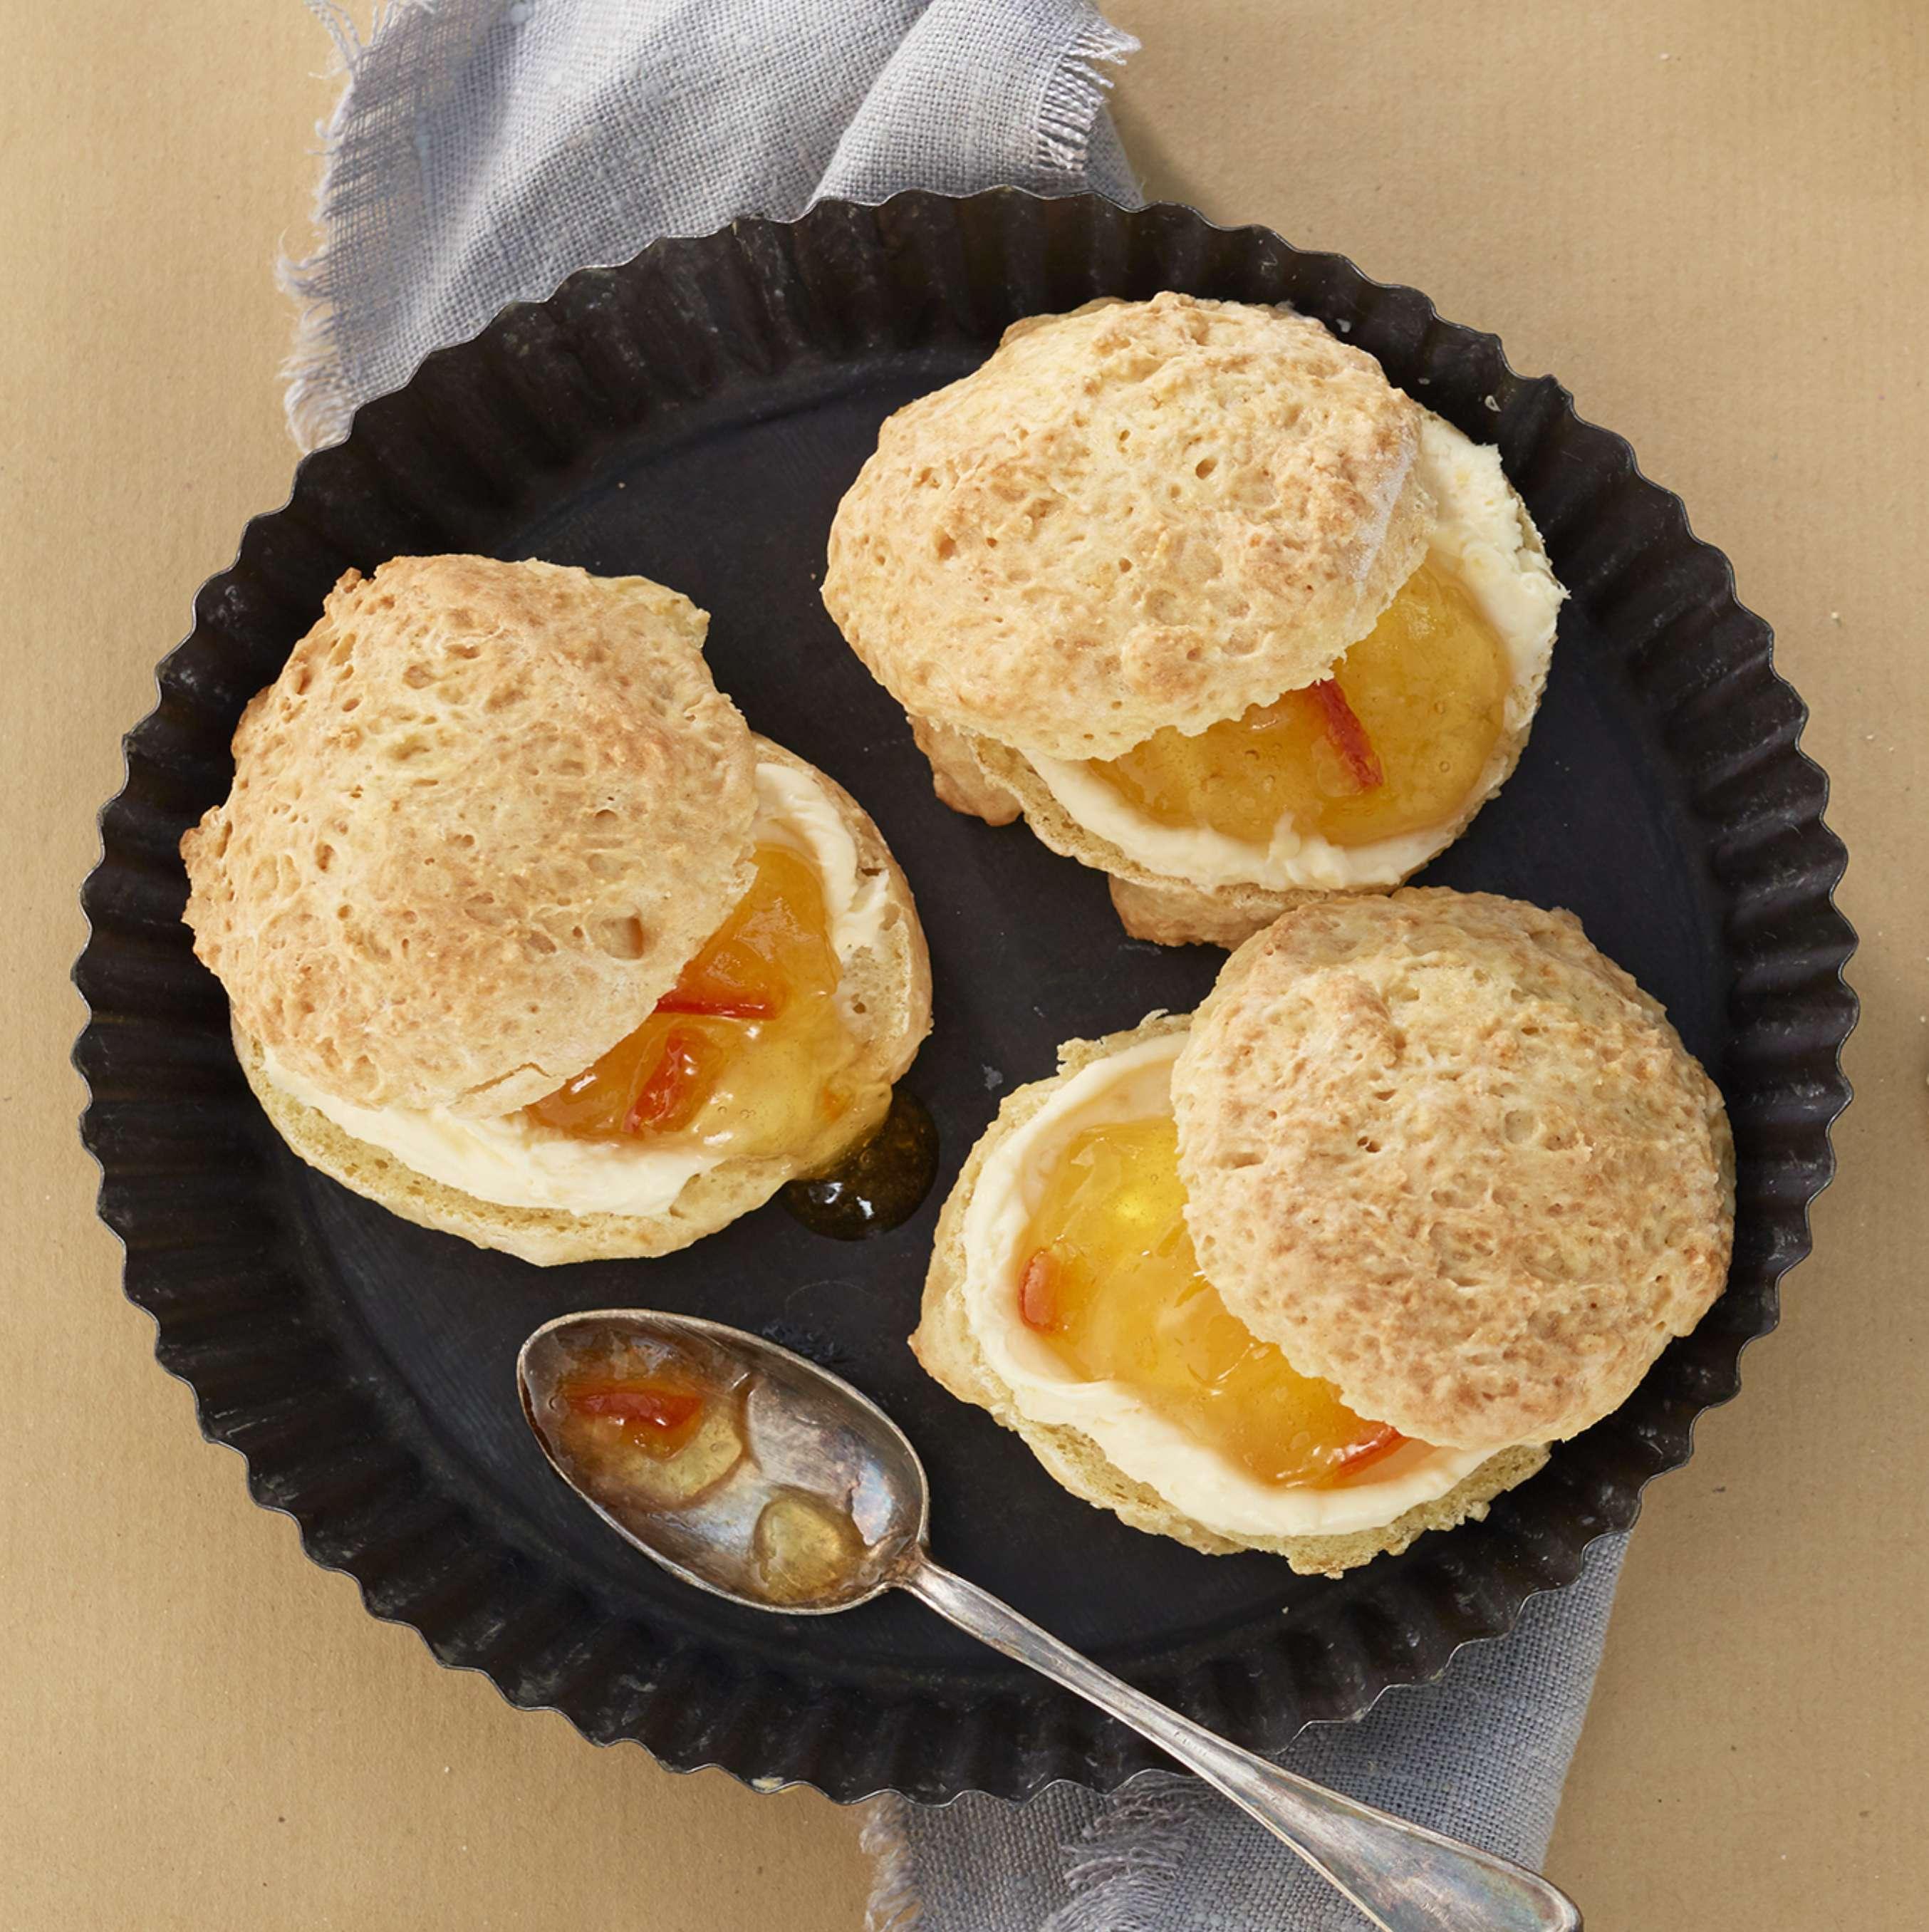 rezept f r buttermilch scones mit clotted cream kaufland. Black Bedroom Furniture Sets. Home Design Ideas